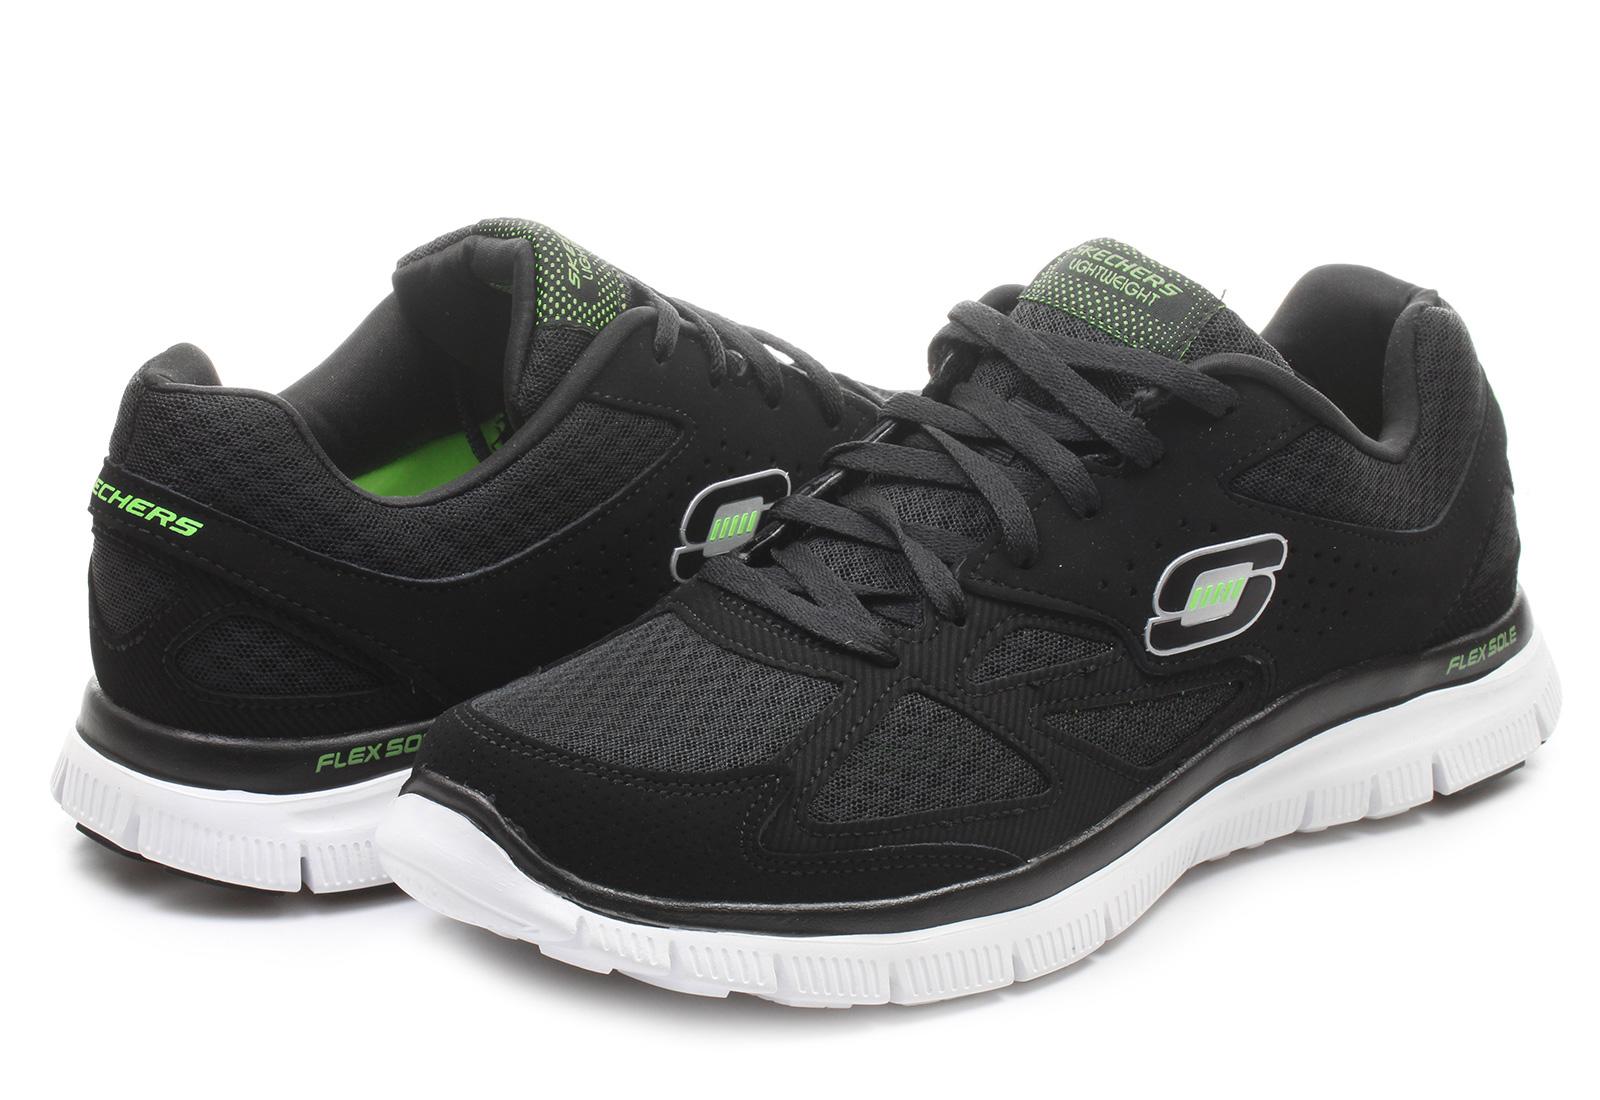 Skechers Shoes - Master Plan - 51252-BKW - Online shop for ... b537bdc7bc2